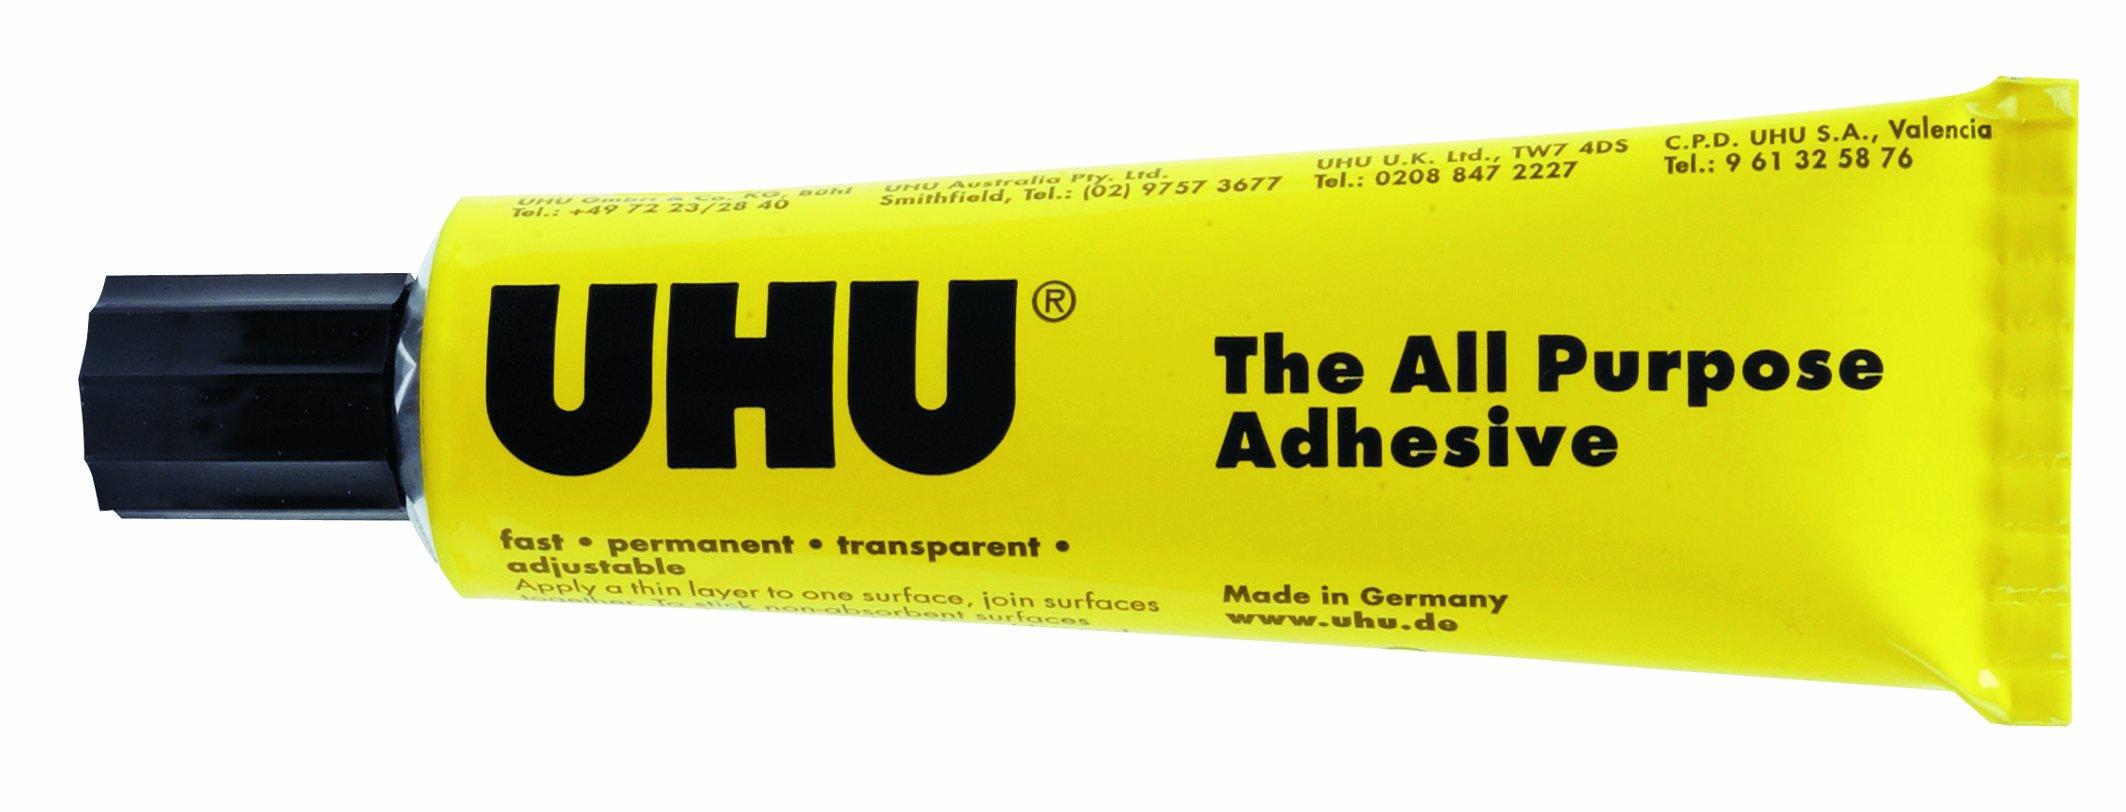 Uhu 38106 All Purpose Adhesive - 125ml Tube